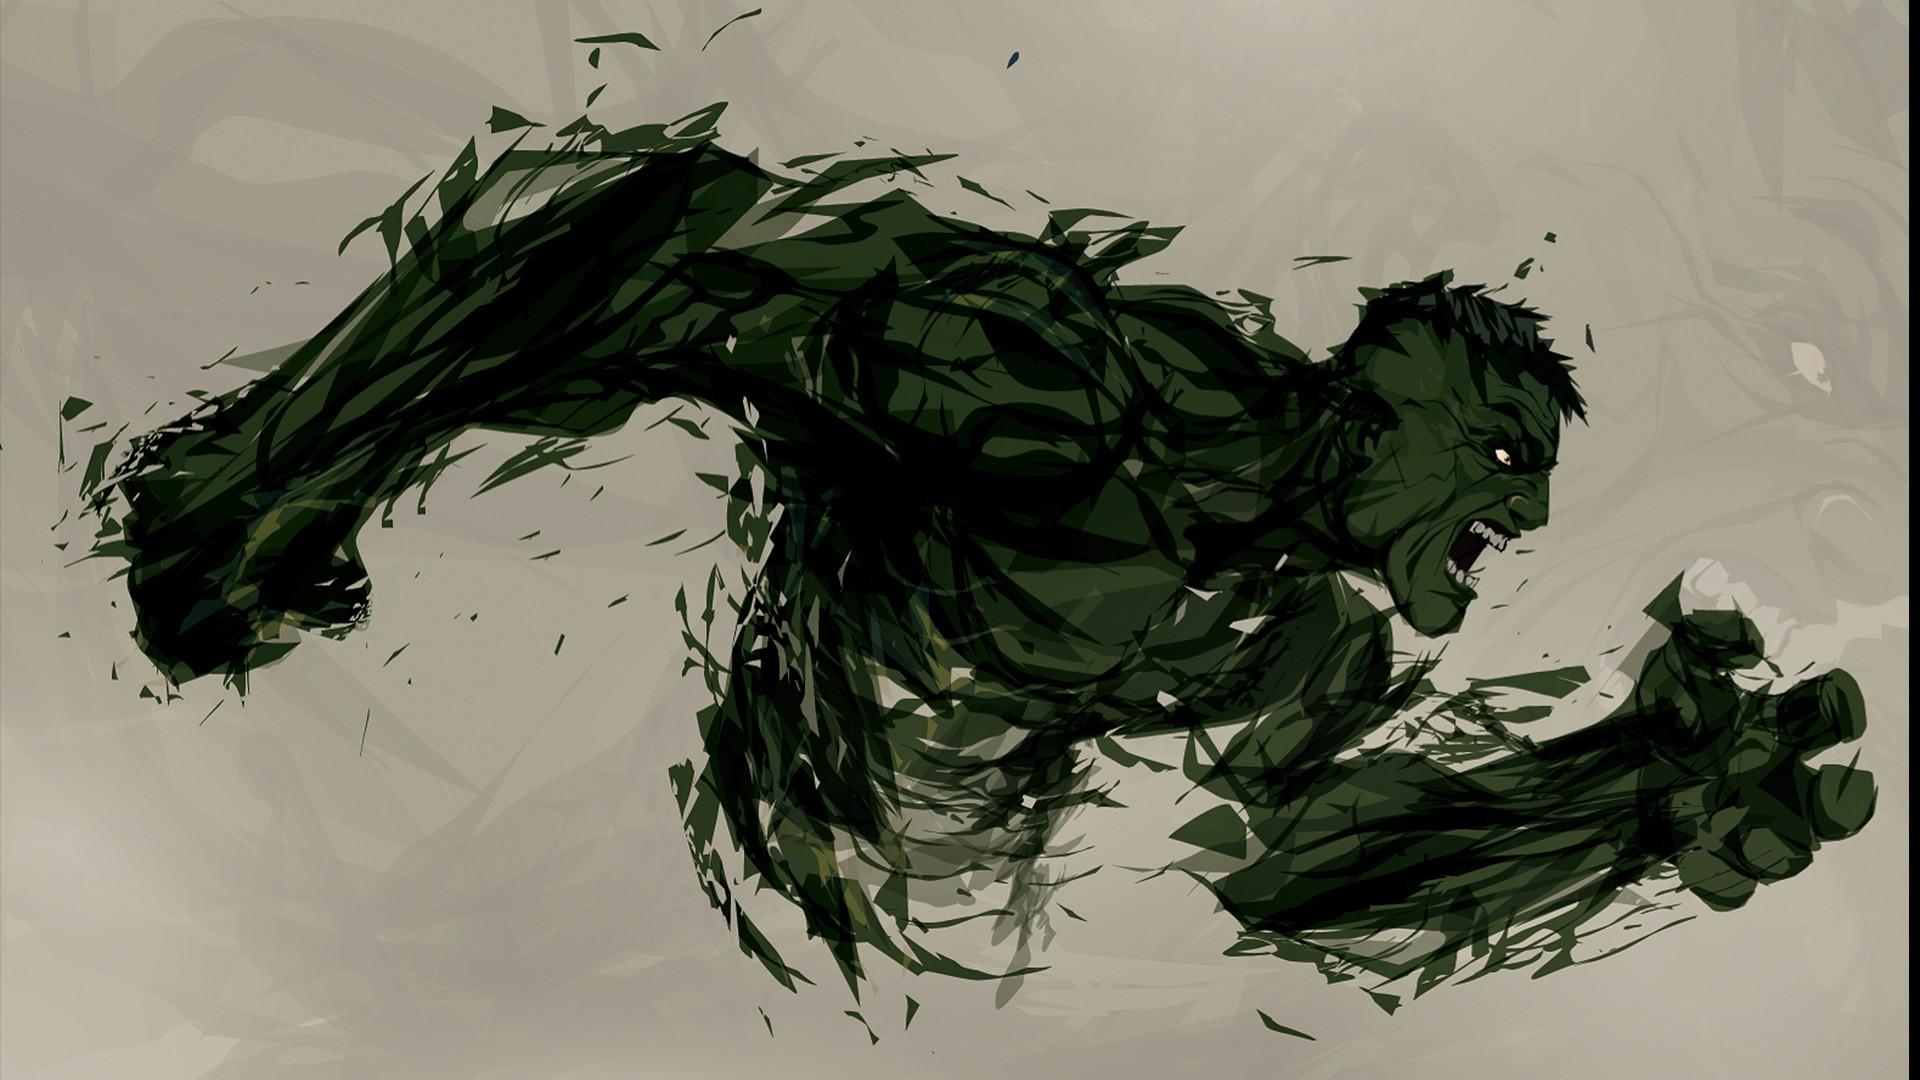 Hd wallpaper hulk - Hd Wallpaper Hulk Incredible Hulk Abstract Art Exclusive Hd Wallpapers 6280